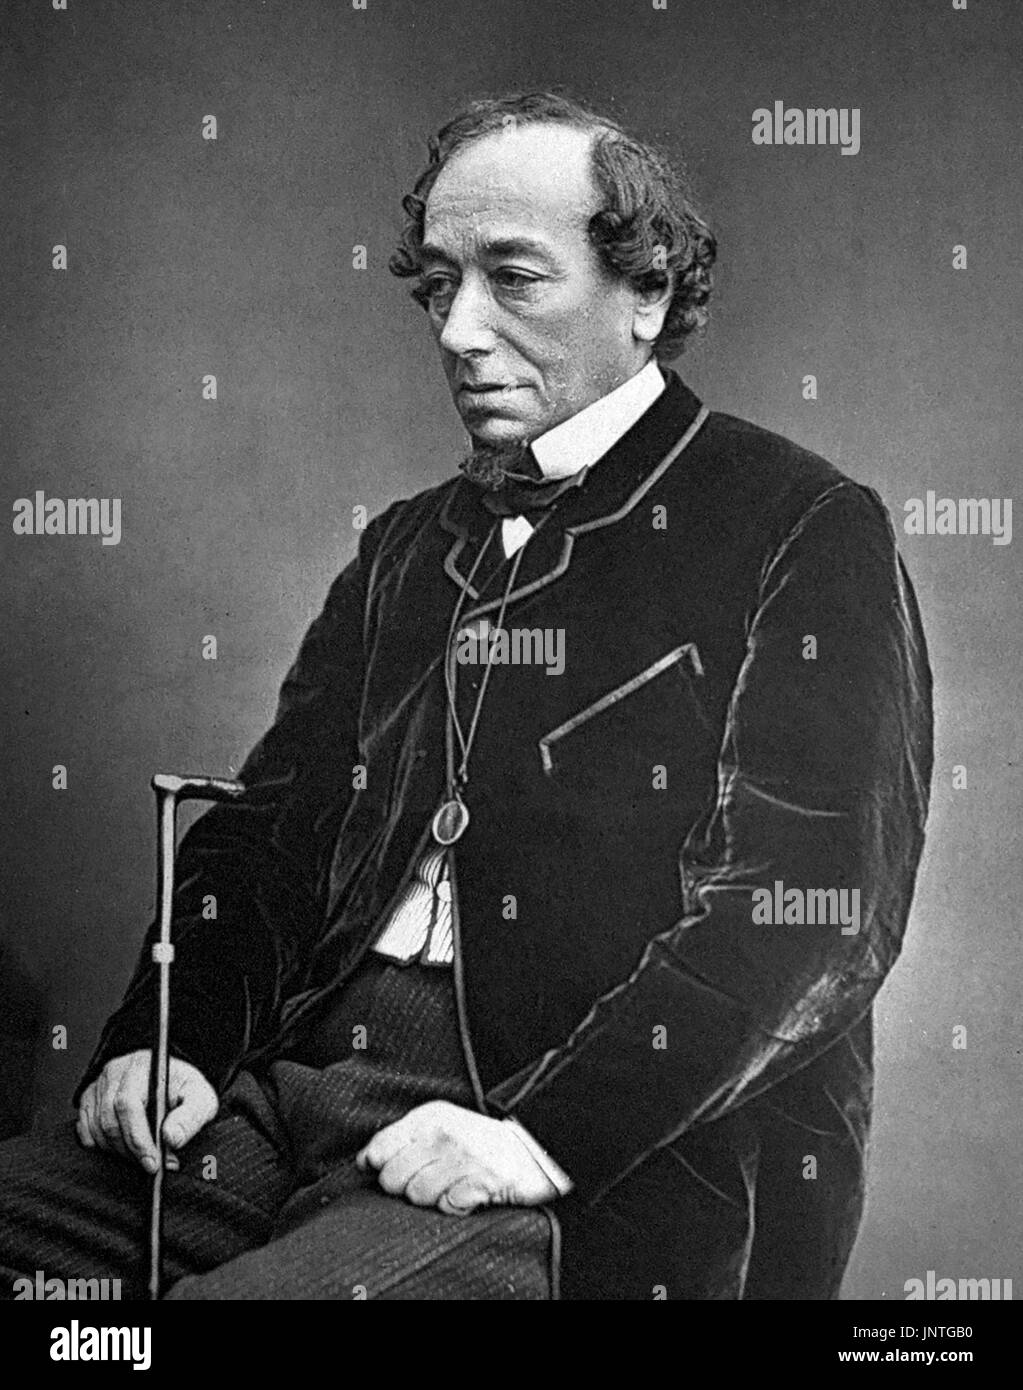 Disraeli. Portrait of Benjamin Disraeli, 1st Earl of Beaconsfield (1804-1881), photograph c.1878 - Stock Image